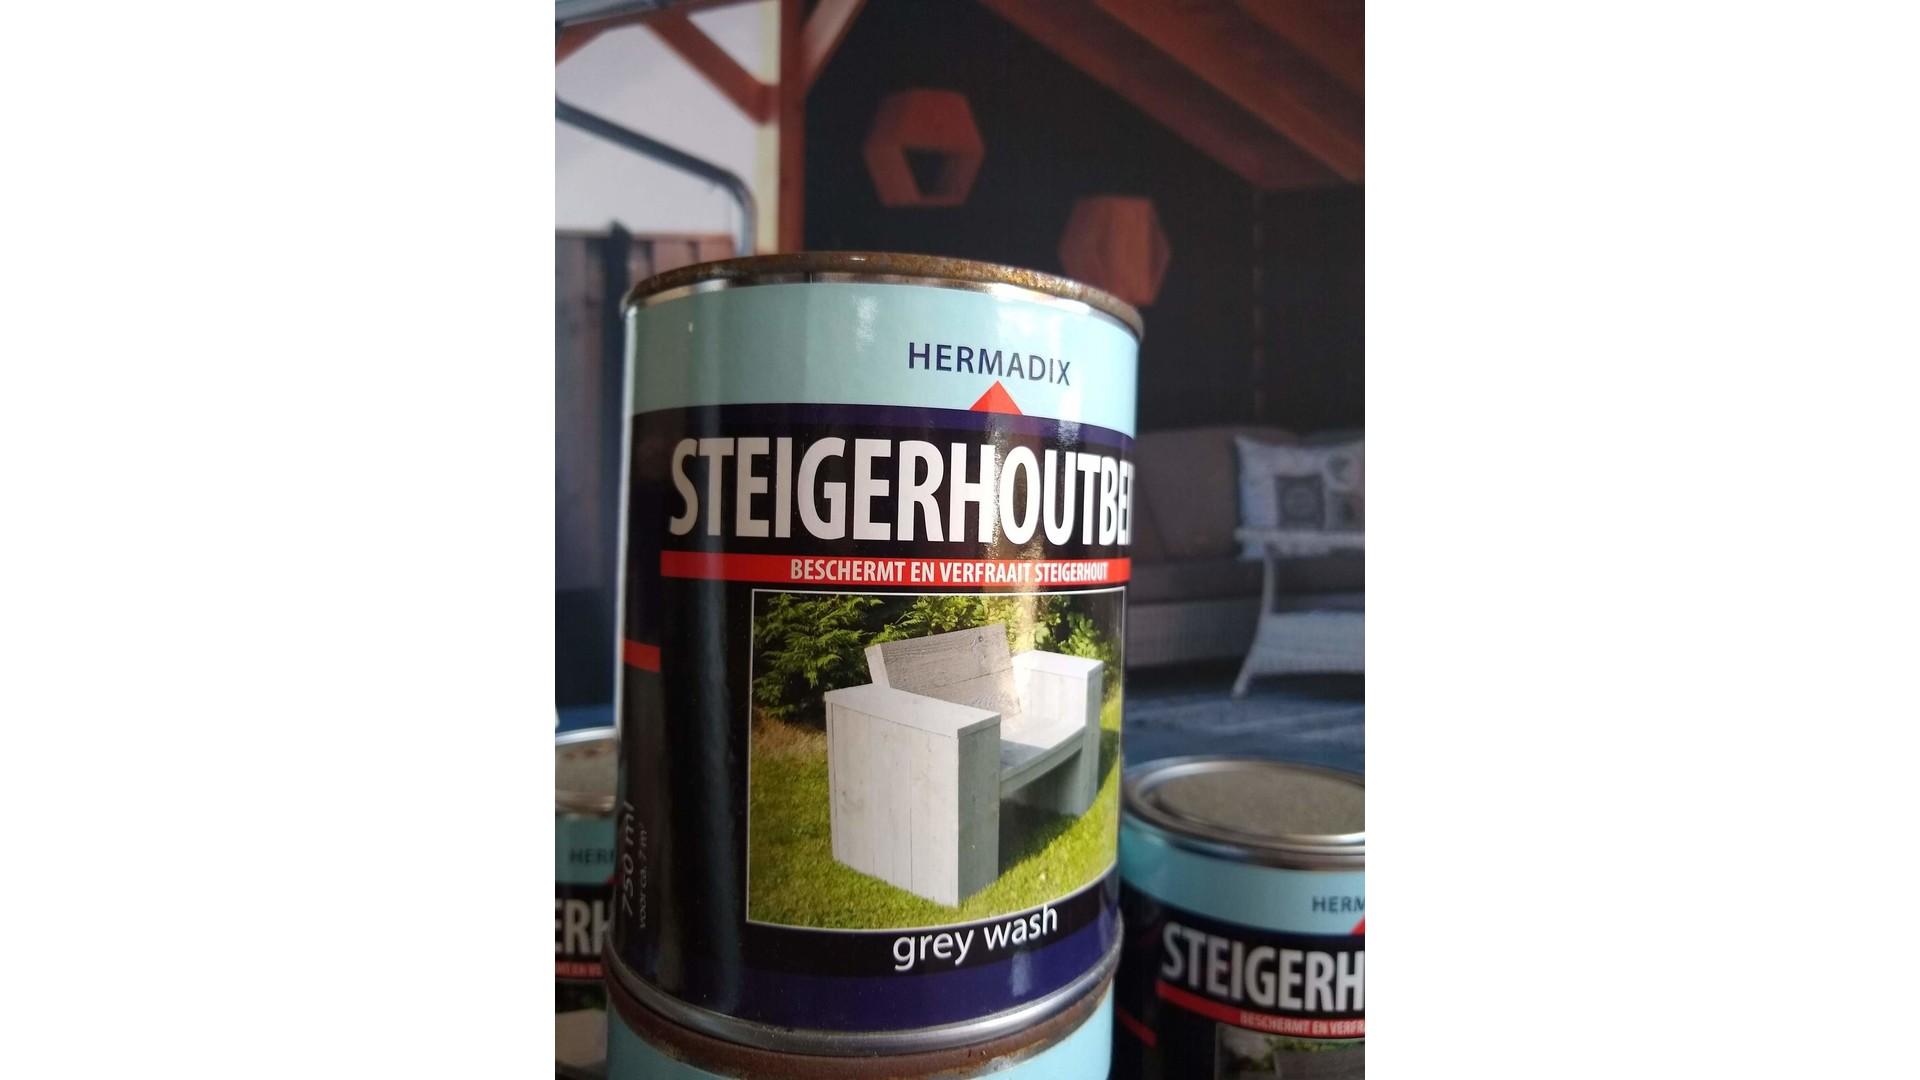 Hermadix Steigerhoutbeits Hermadix